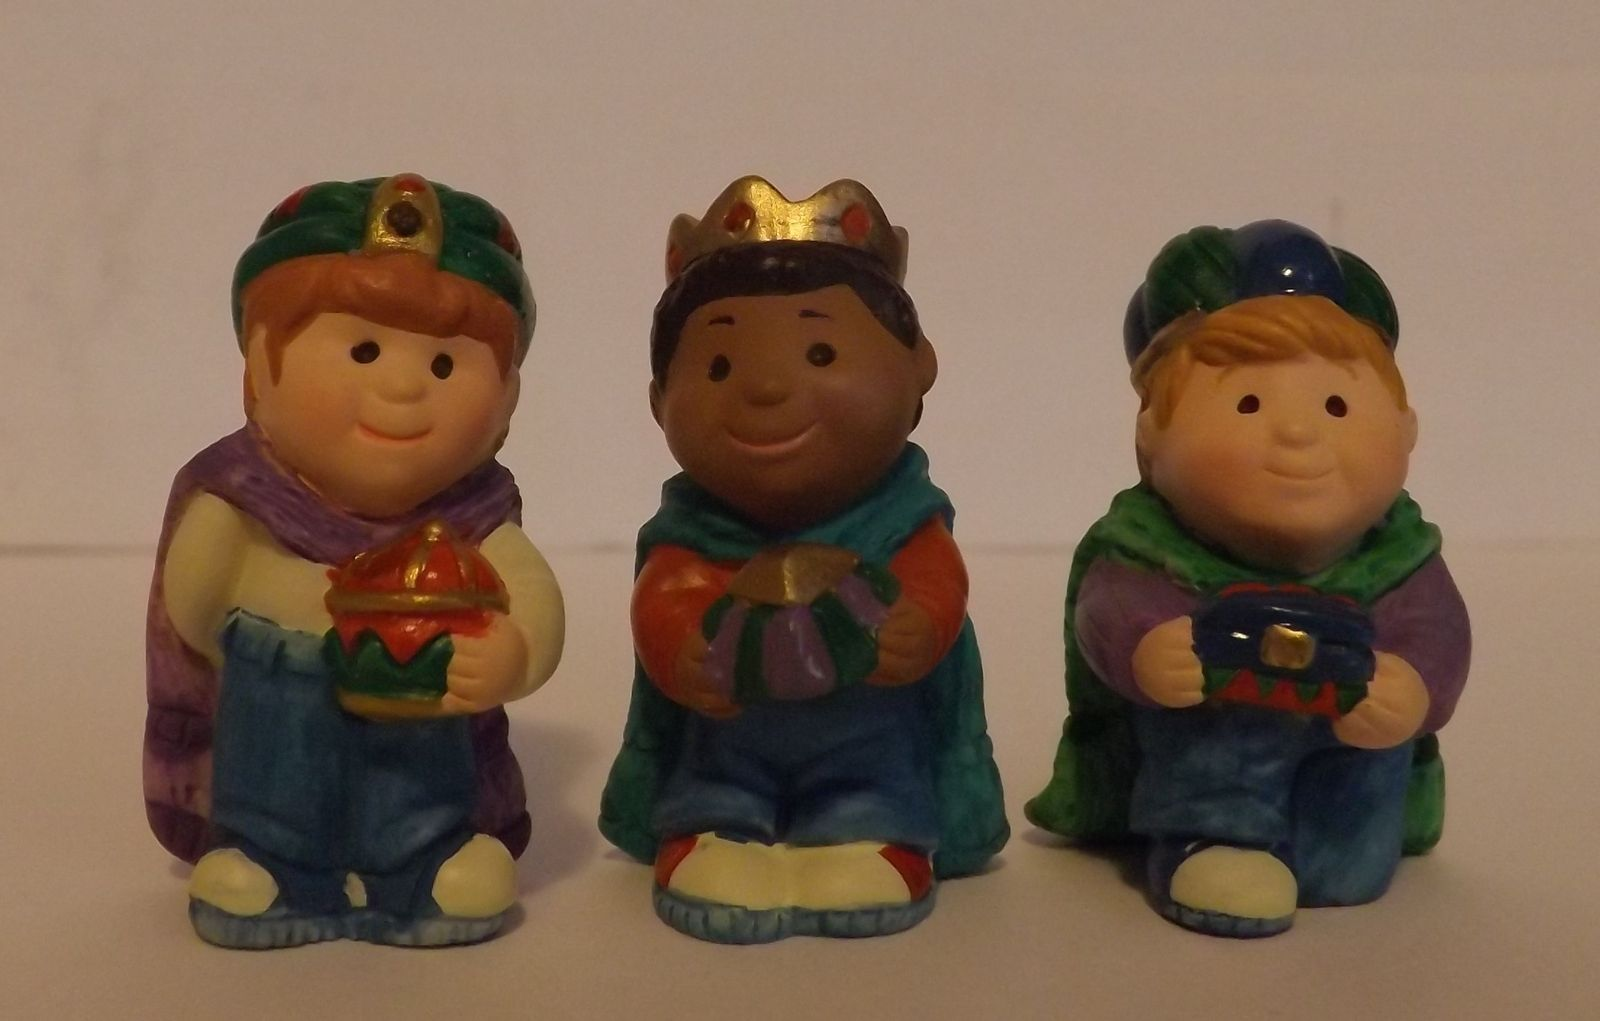 Hallmark Merry Miniatures Three Wee Kings 3-Piece Set Holidays 1997 image 2